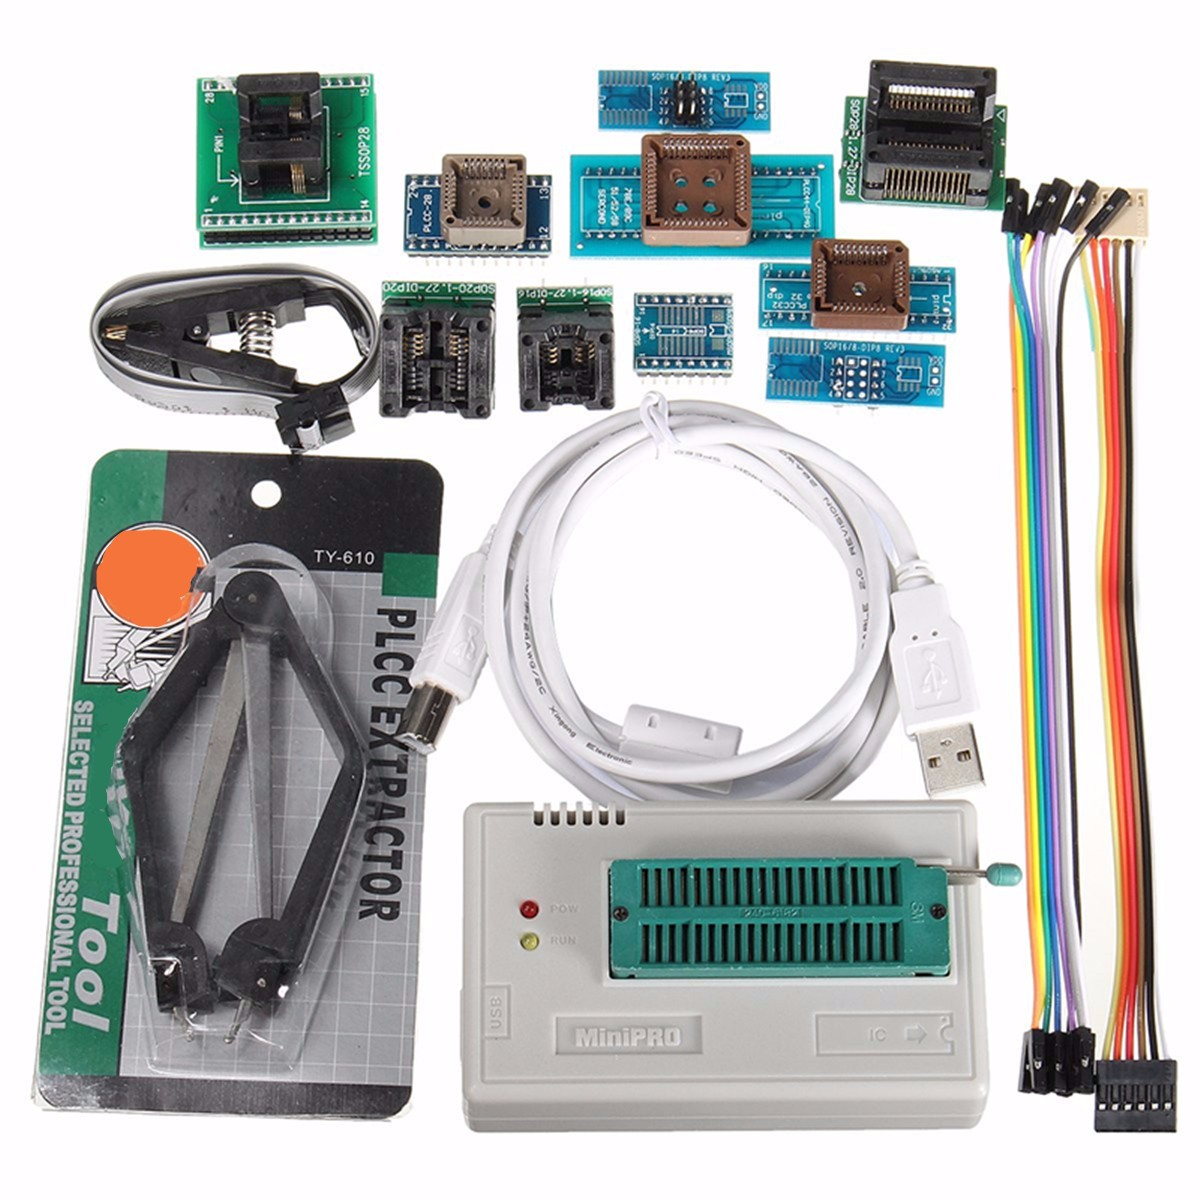 Wholesale TL866II USB Mini Pro Programmer With 10pcs Adapter EEPROM FLASH AVR MCU SPI ICSPWholesale TL866II USB Mini Pro Programmer With 10pcs Adapter EEPROM FLASH AVR MCU SPI ICSP